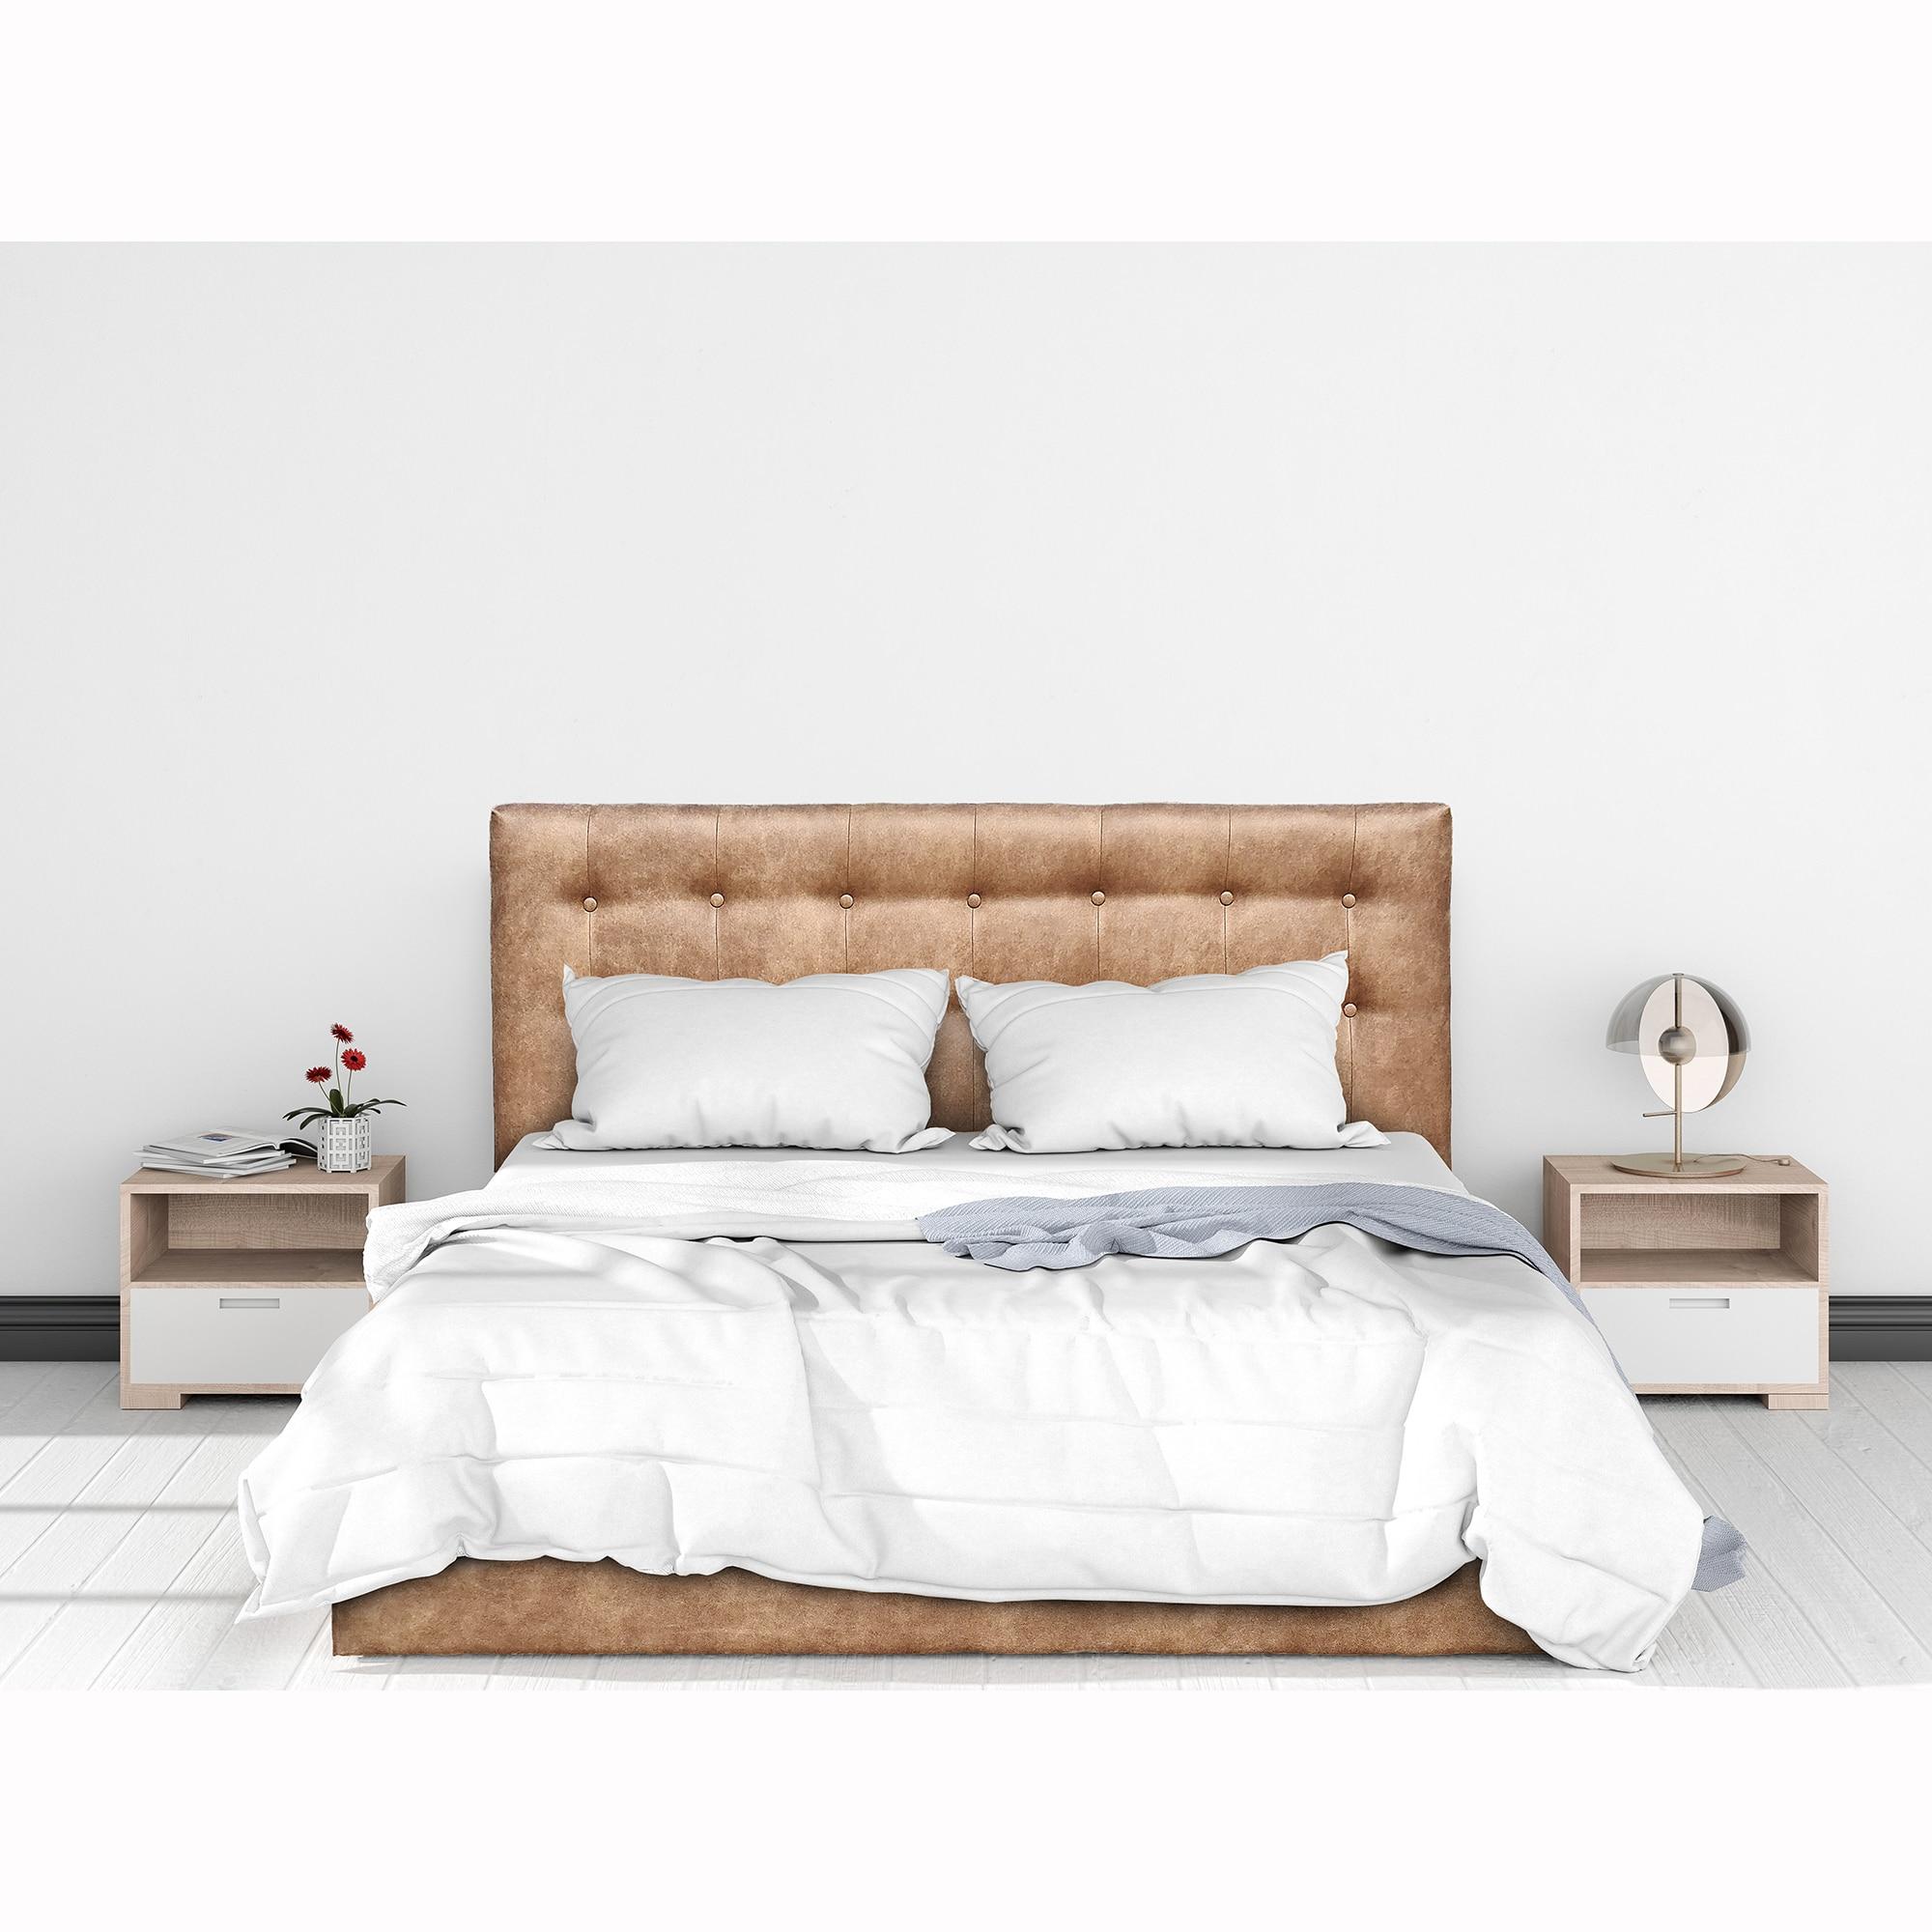 Fotografie Pat Kring Sensation, 212x172x105 suprafata dormit 160x200 cm, lada depozitare, stofa culoare maro